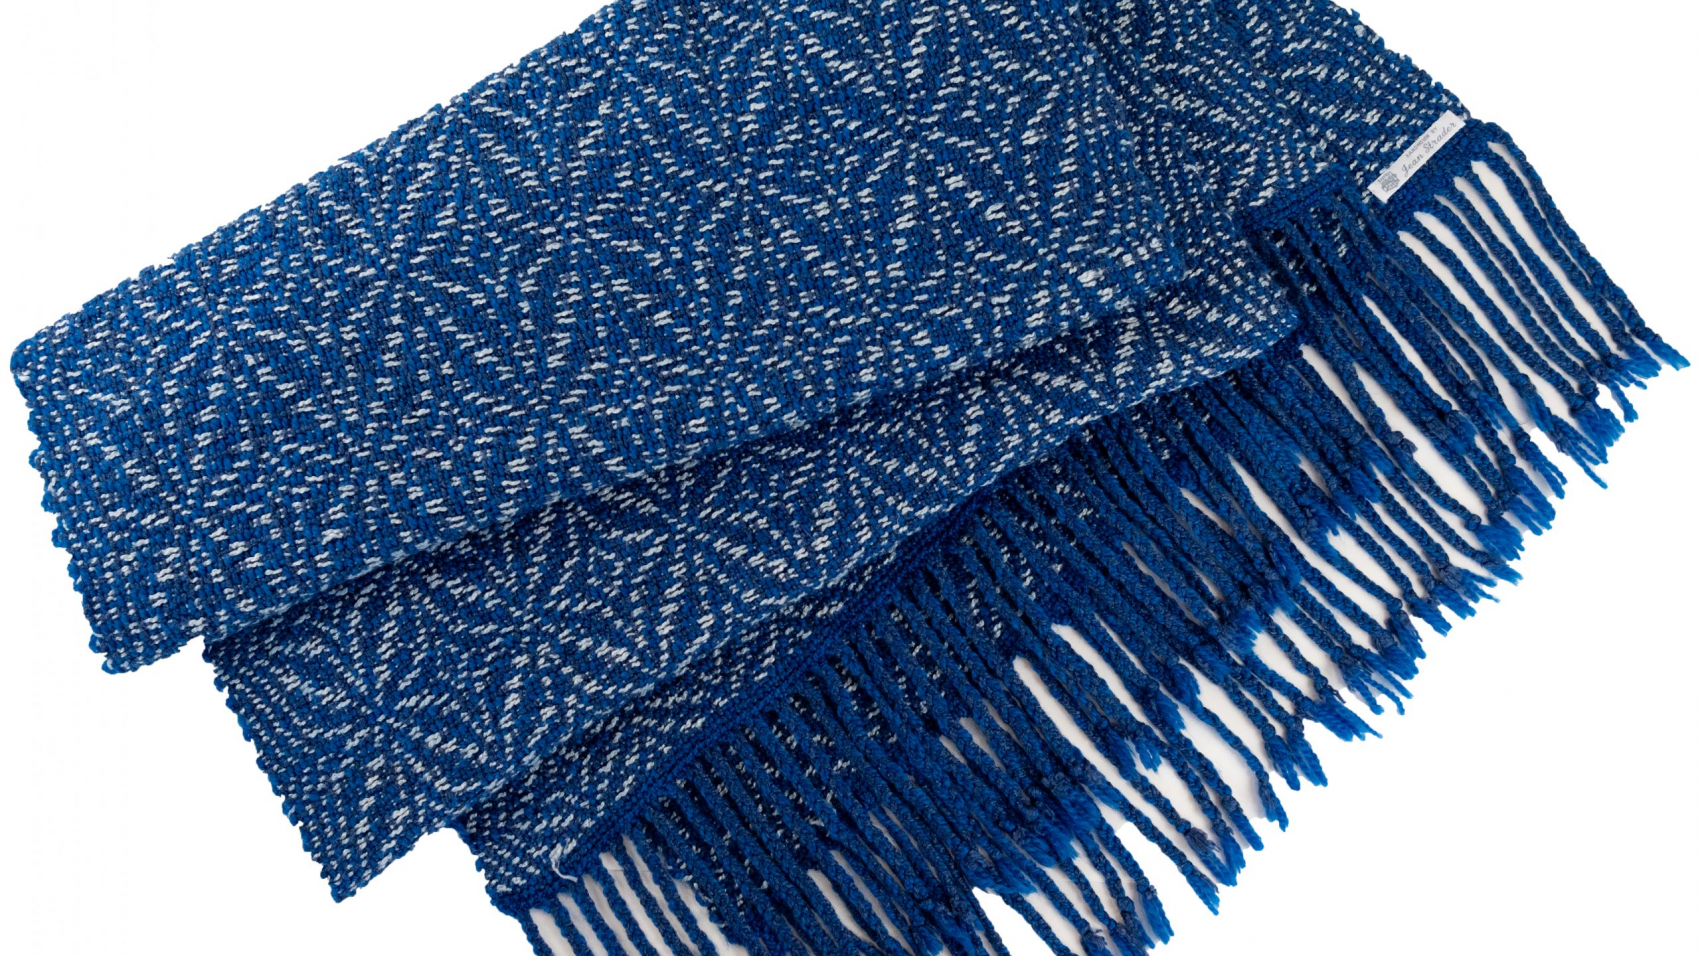 Blue and cream shawl with staf of Bethlehem